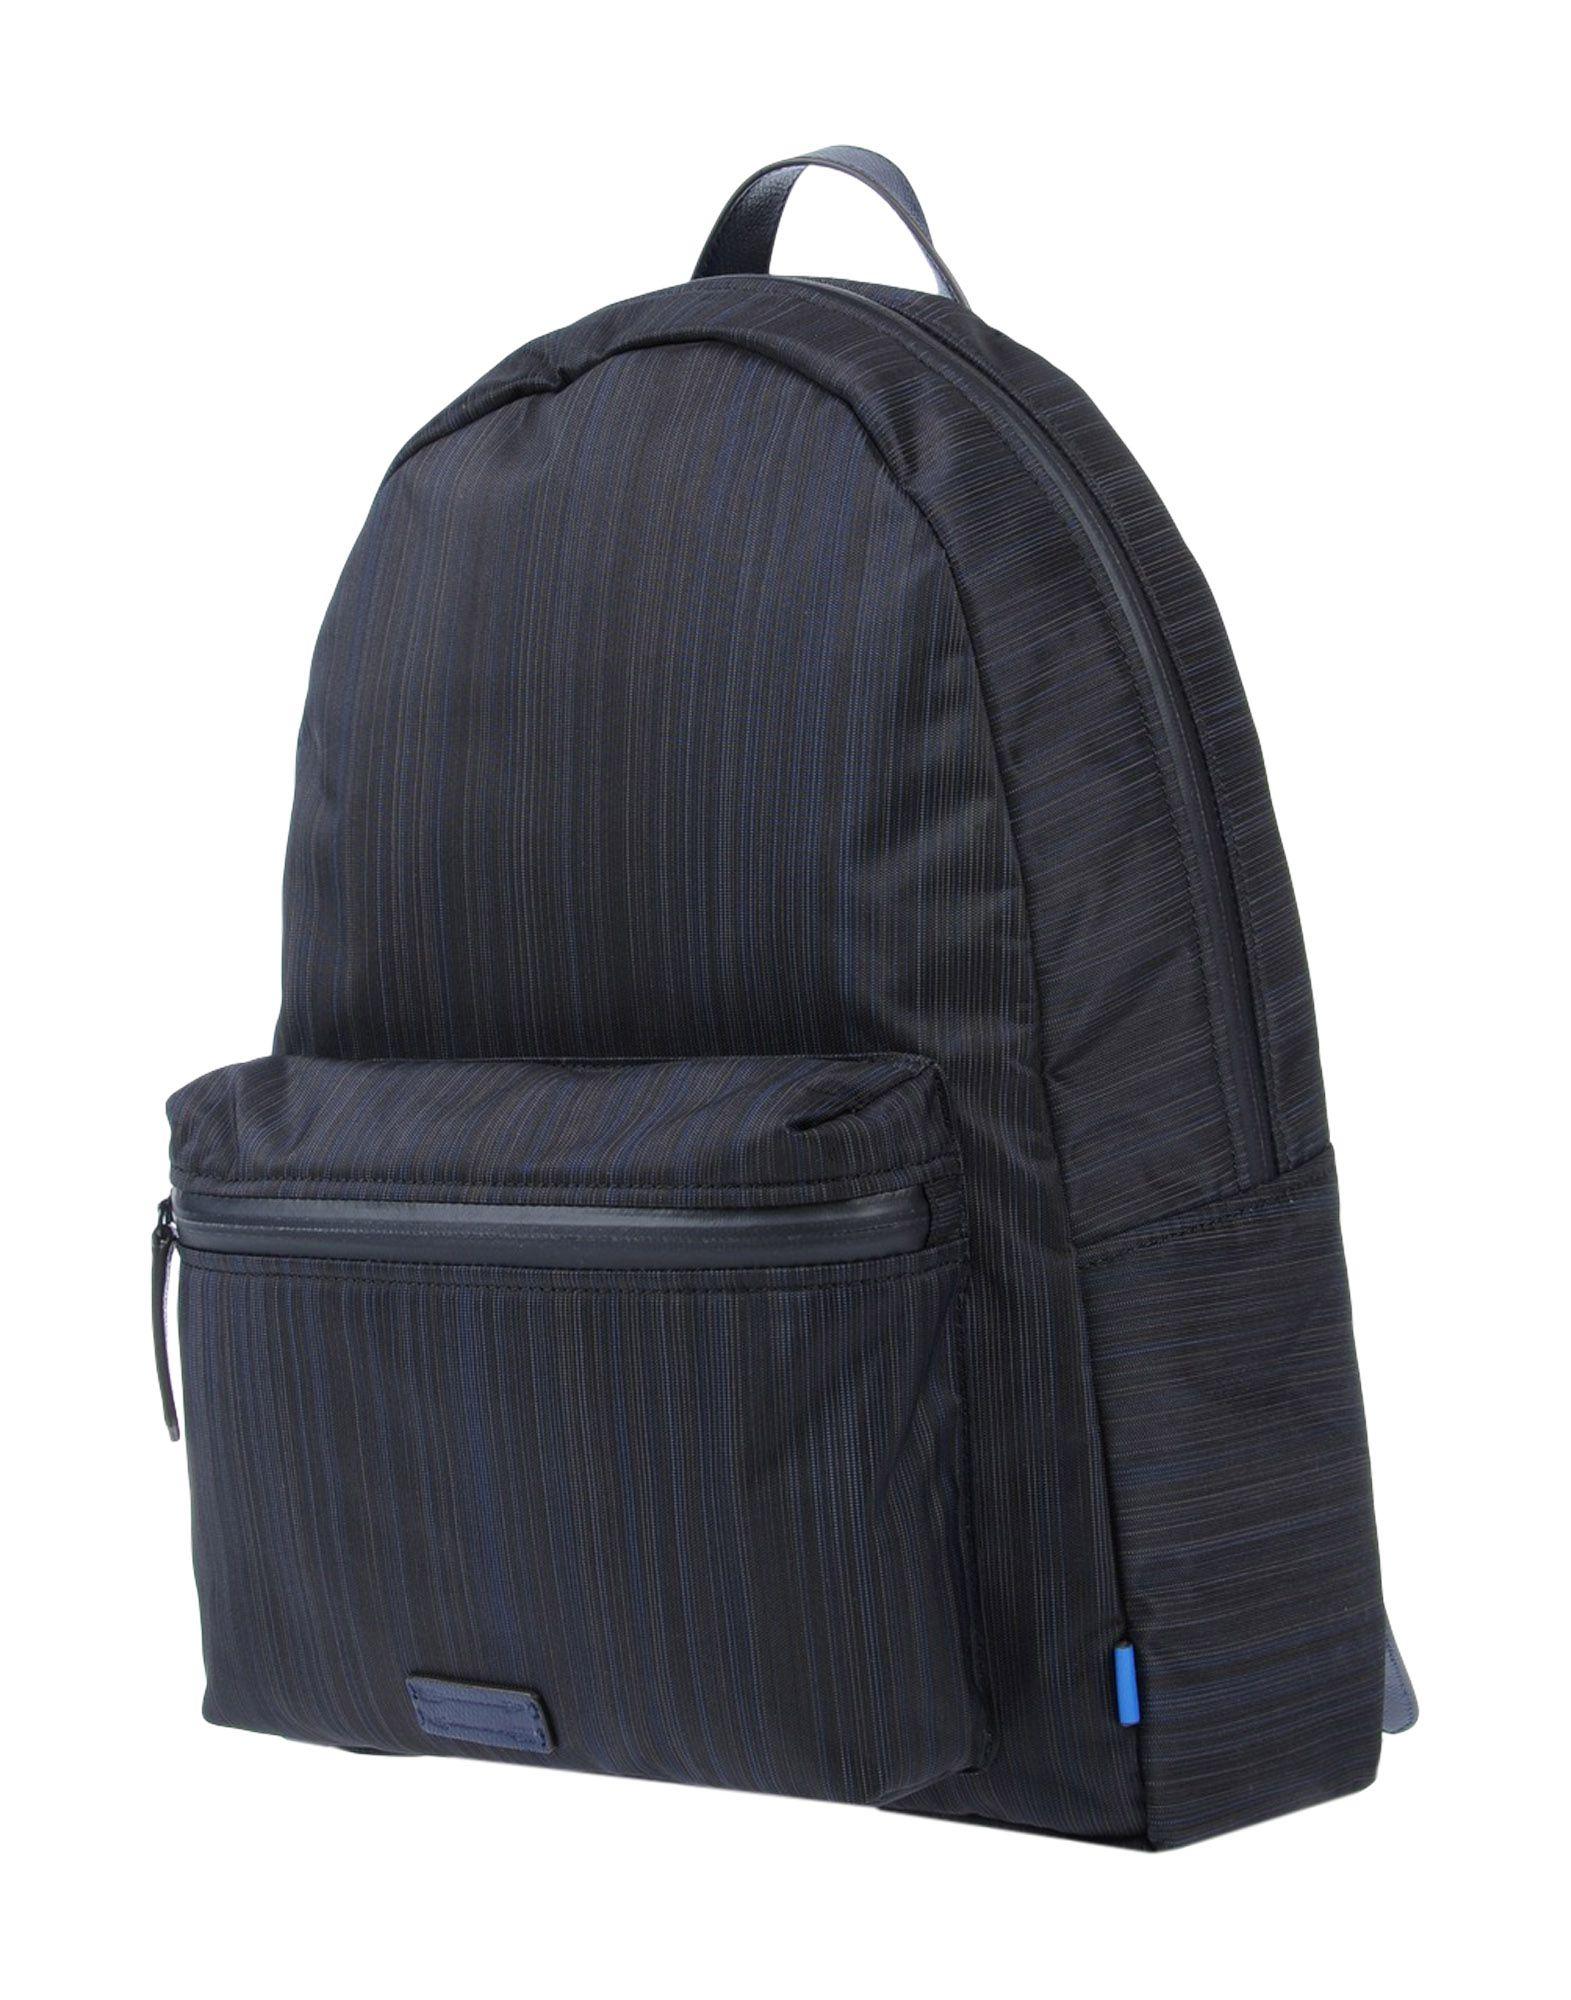 URI MINKOFF Рюкзаки и сумки на пояс женщины pu кожа сумочкакожаные сумки messenge